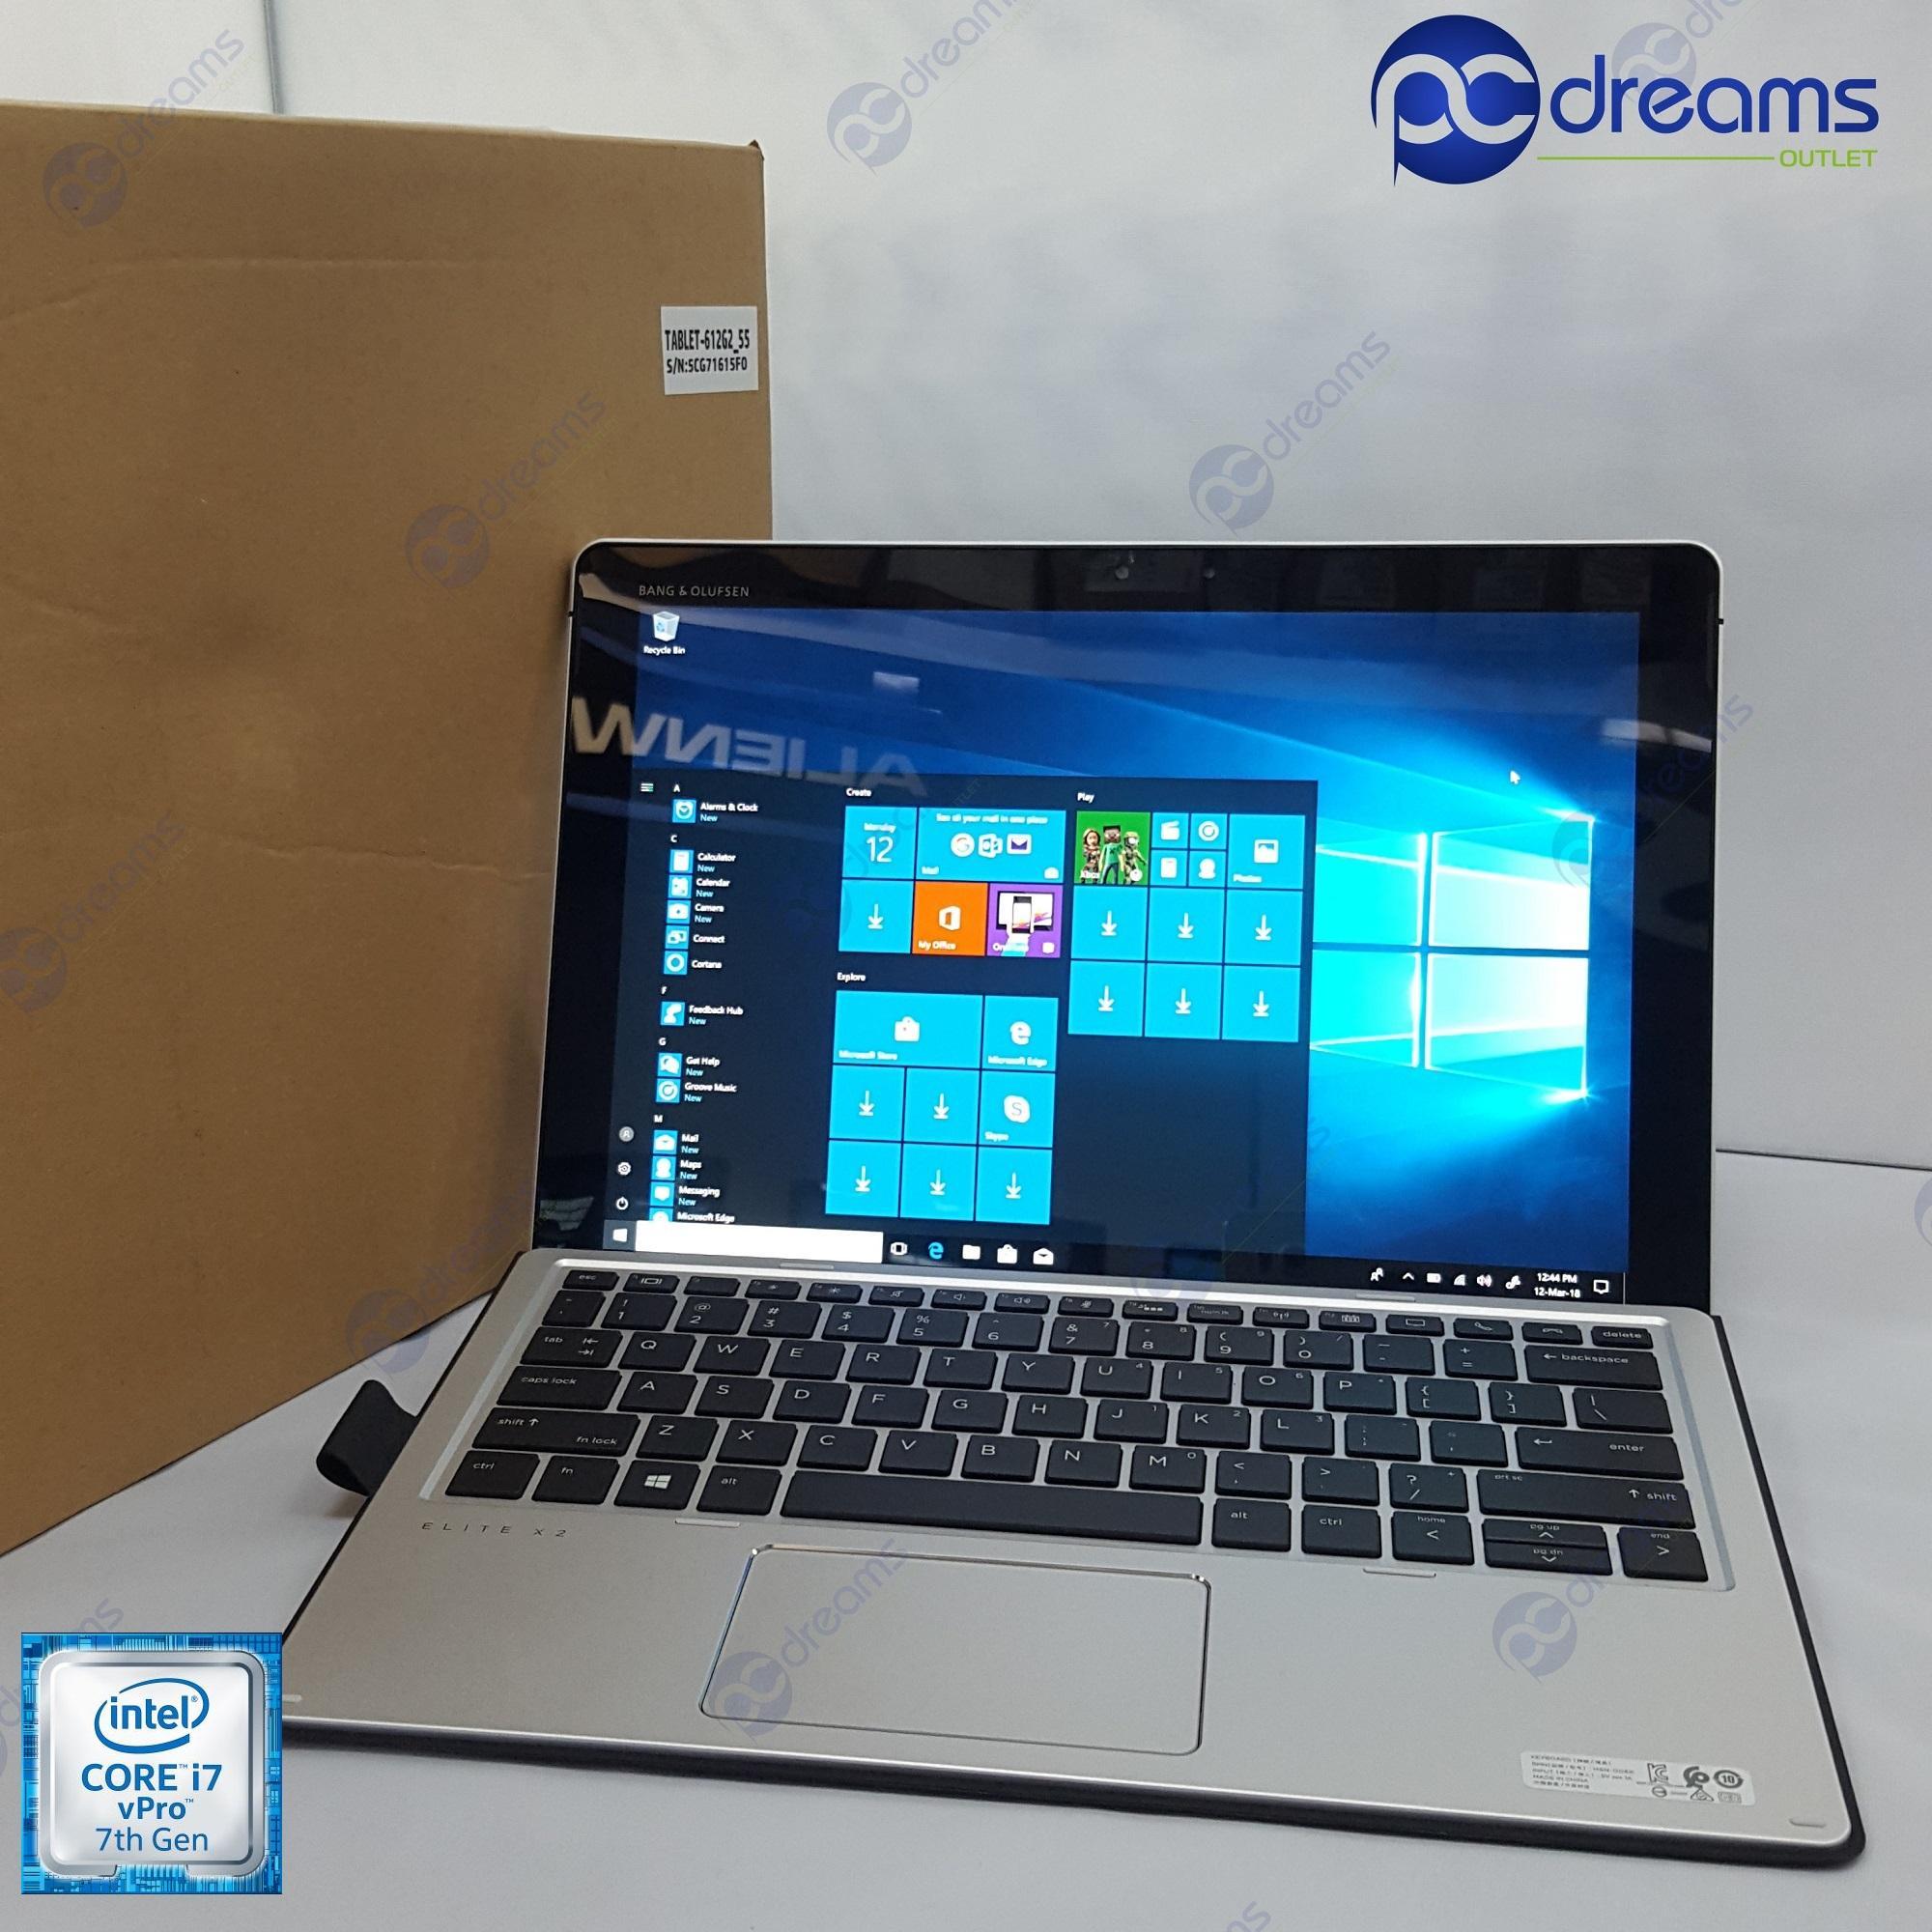 COMEX 2018! HP ELITE X2 1012 G2 with Travel Keyboard (Y5E19AV) i5-7200U/8GB/512GB PICe NVMe SSD [Premium Refreshed]